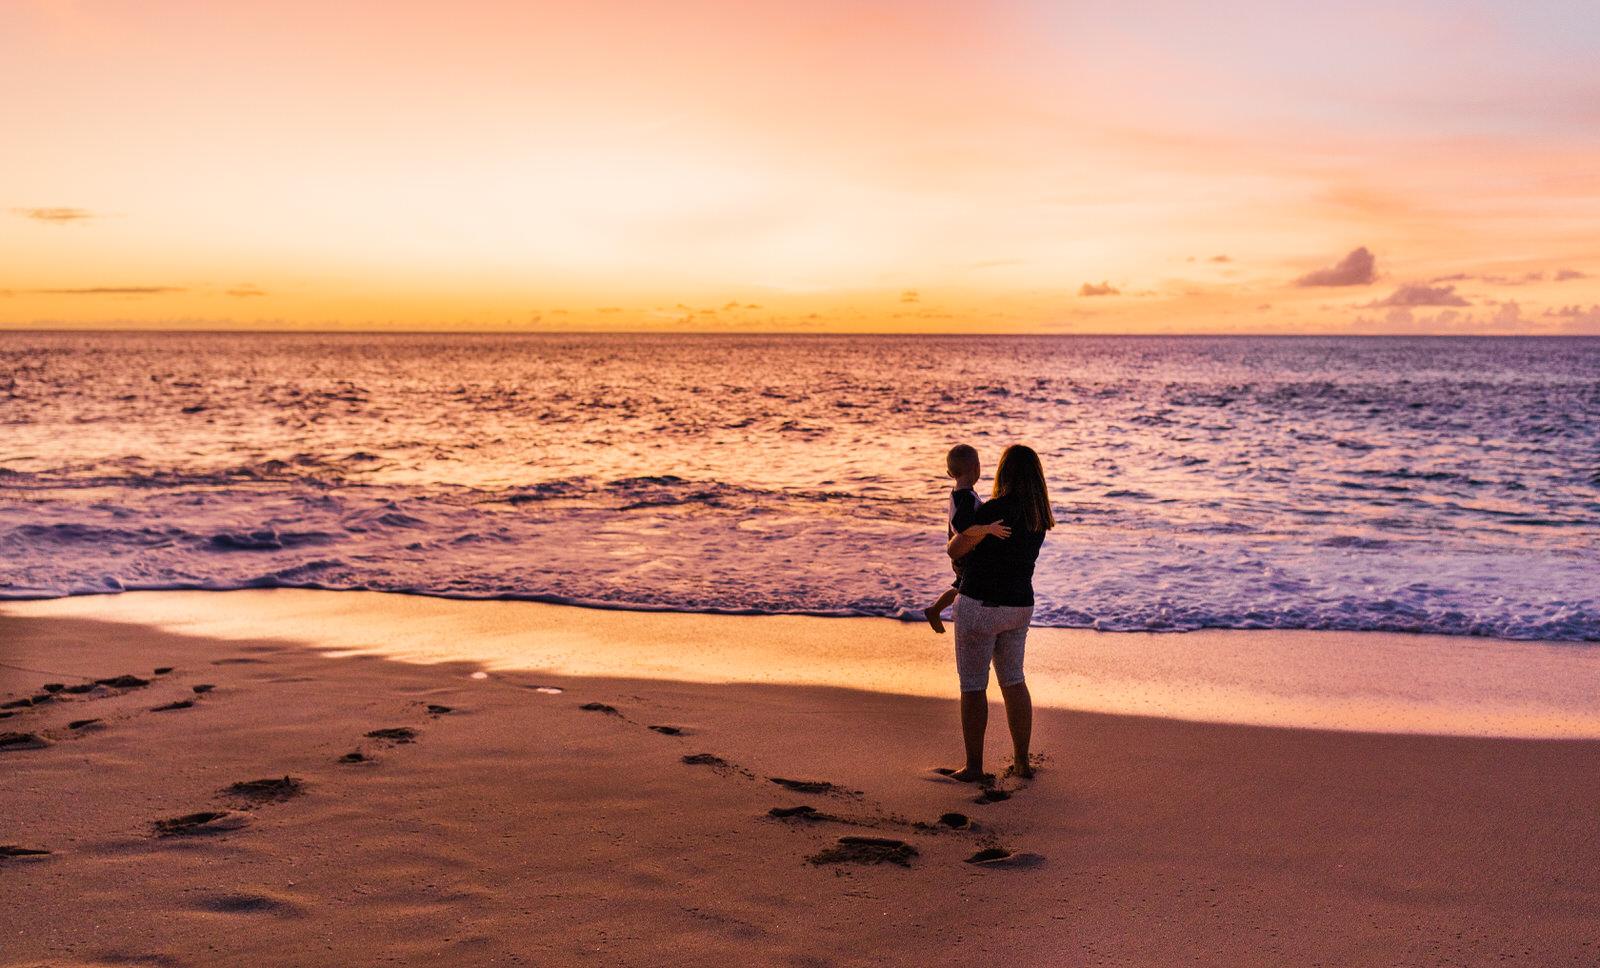 extended-family-big-island-vacation-cousins-grandparents-beach-waikoloa-sunset-hawaii-7486.jpg